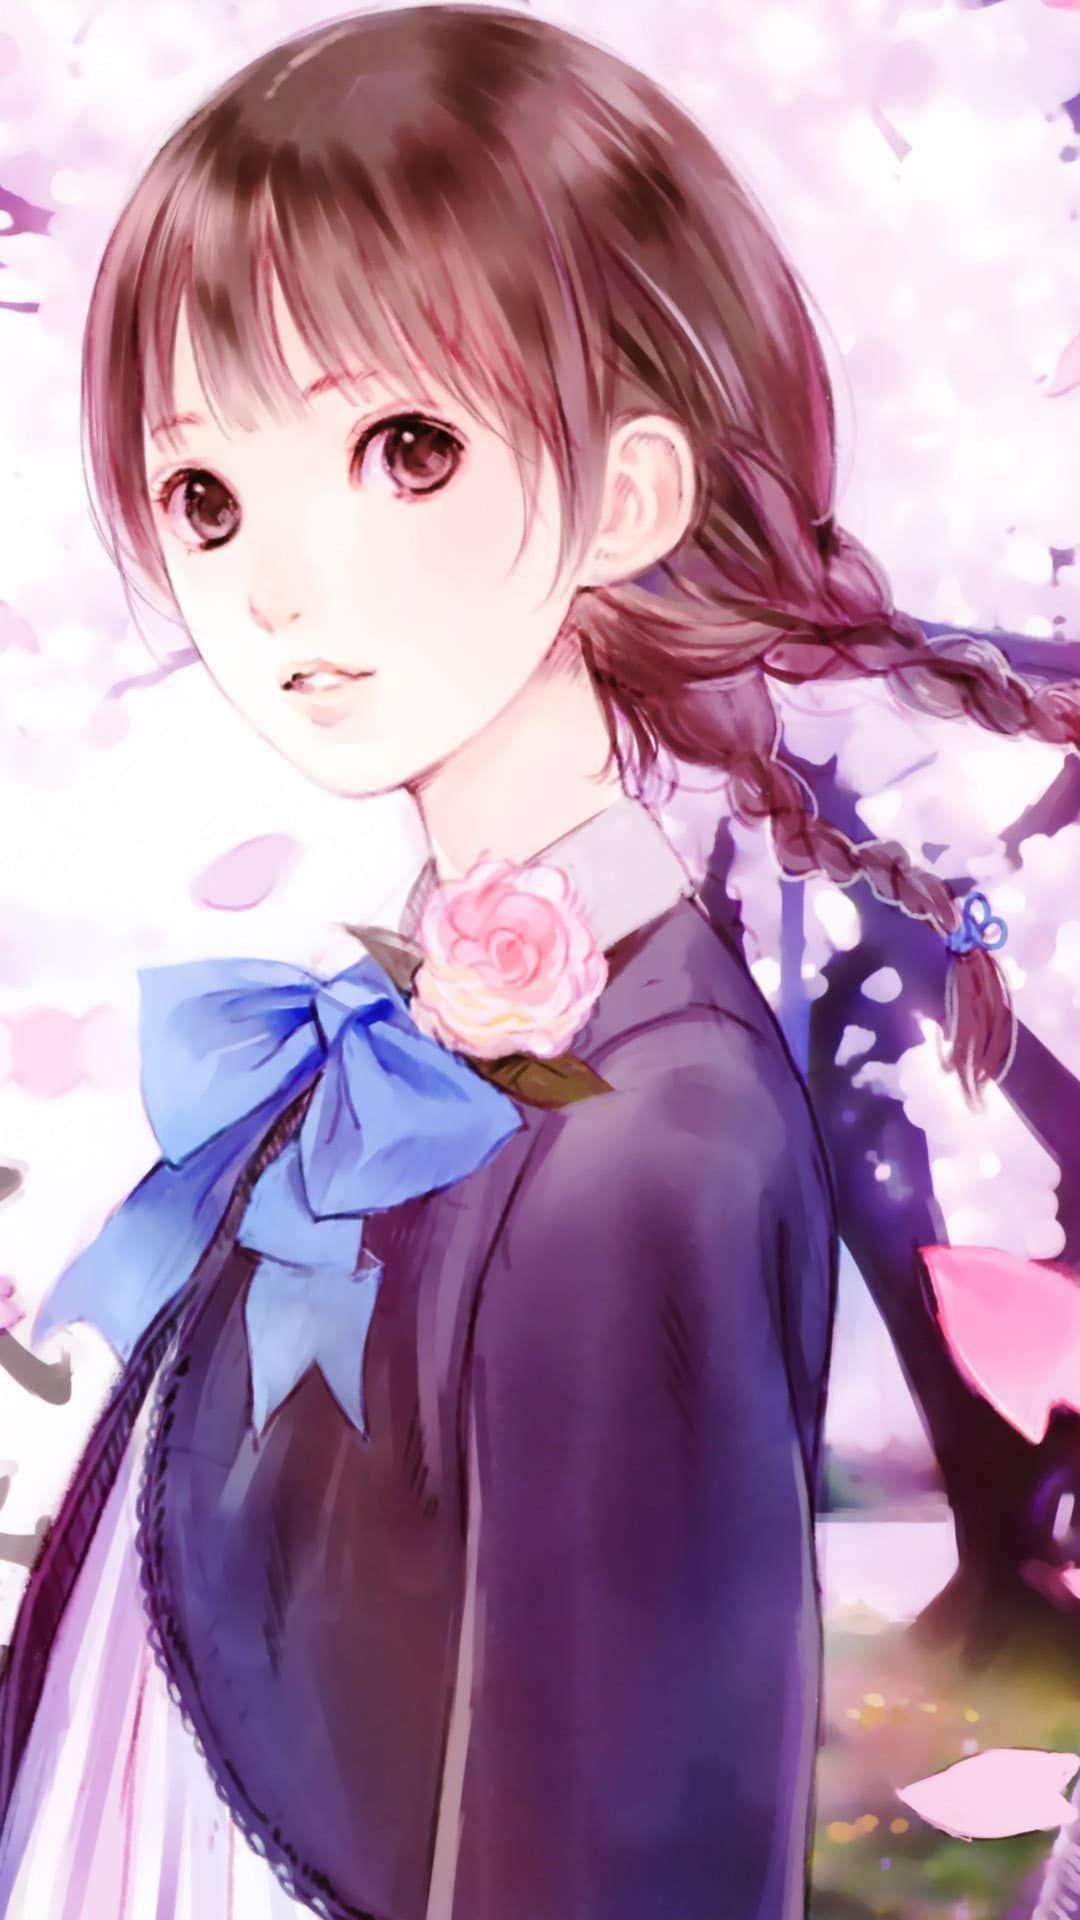 Cute Anime Girl Mobile Wallpaper Secondtofirst Com